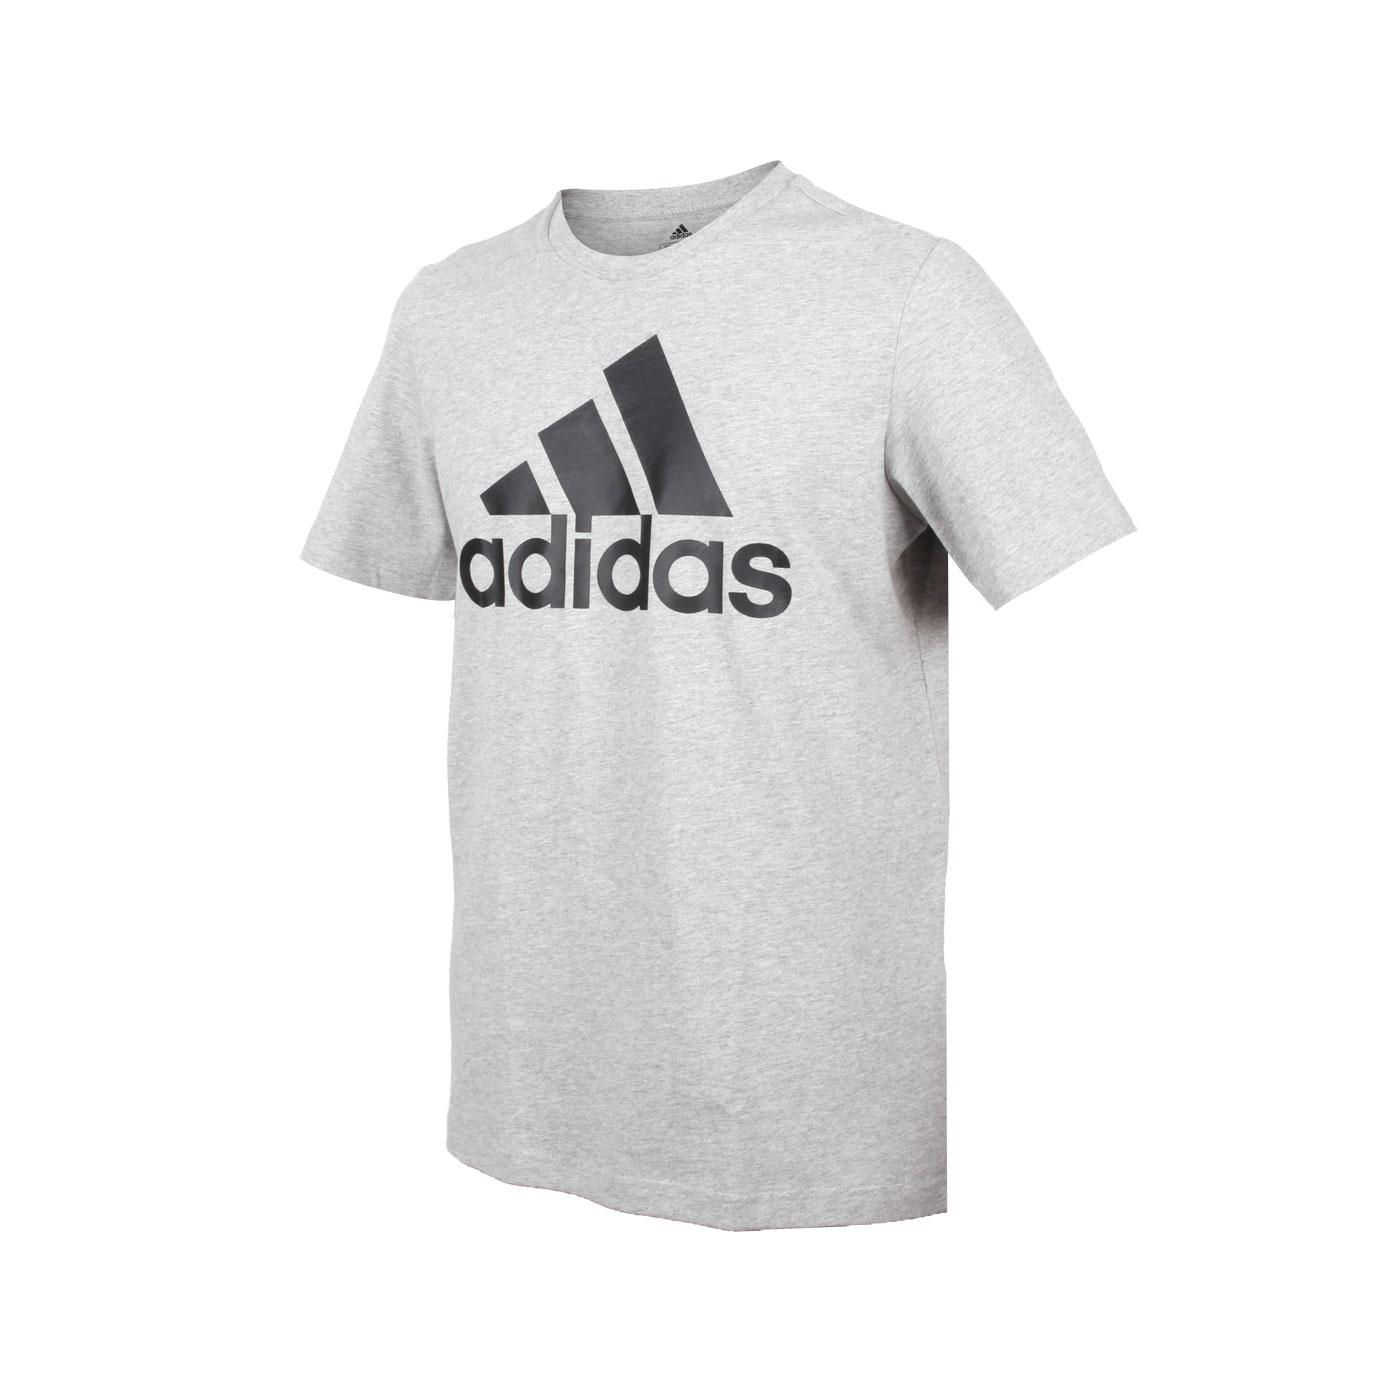 ADIDAS 男款短袖T恤 GK9123